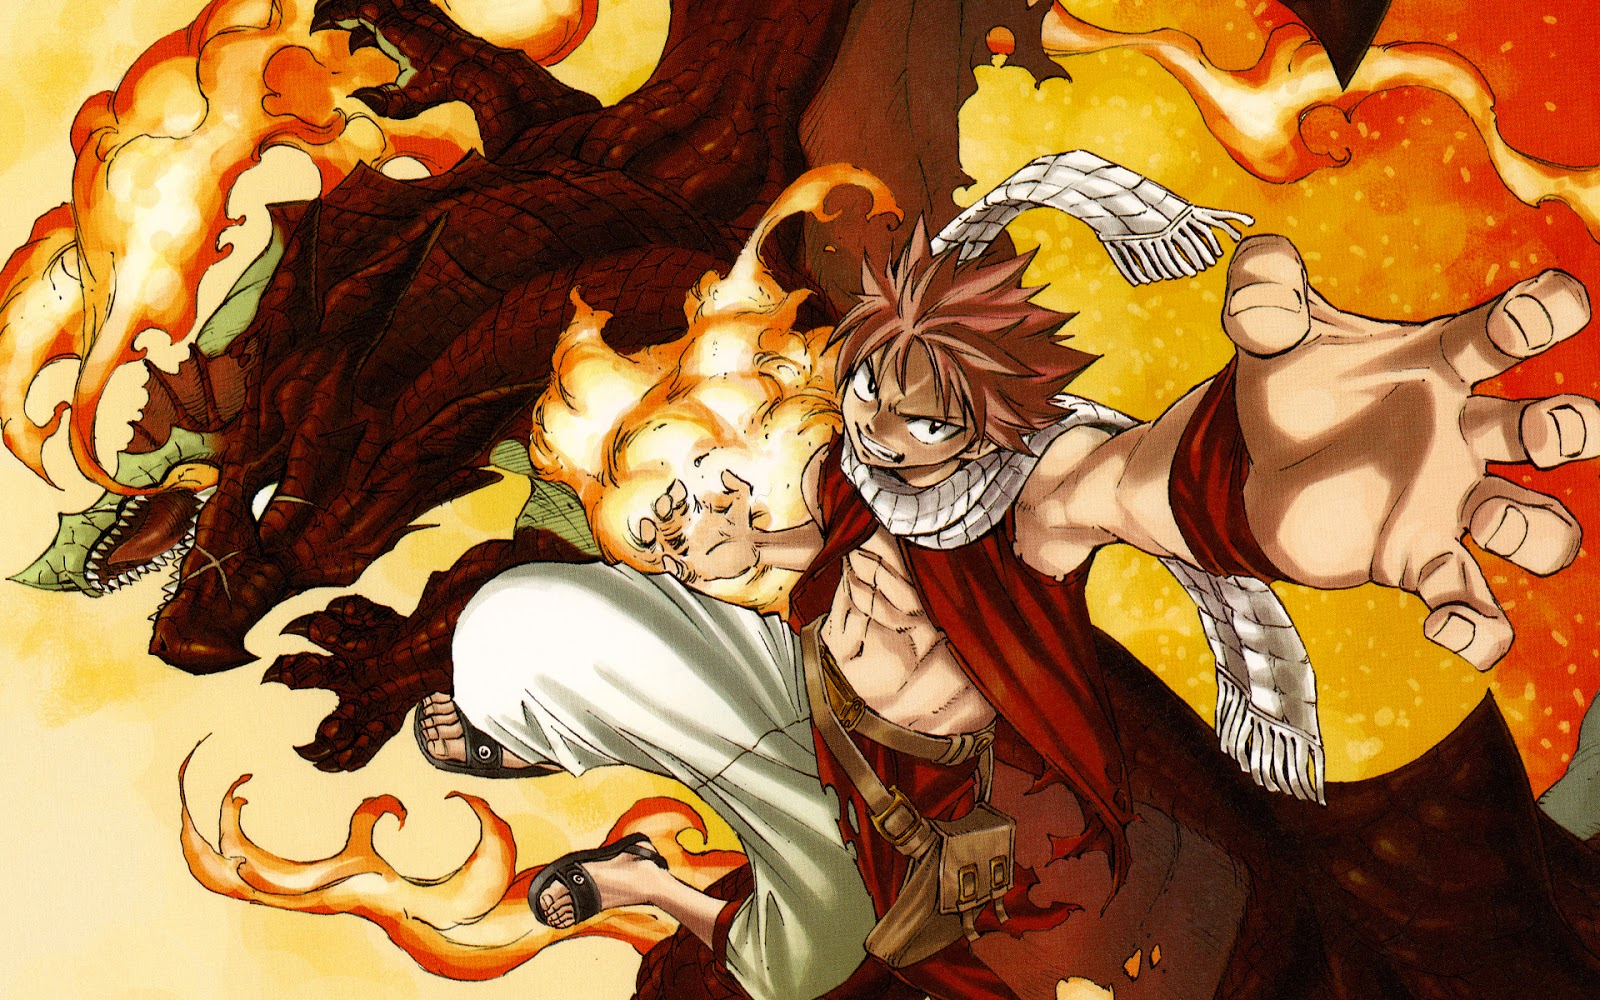 natsu dragneel and igneel fire dragon fairy tail anime hd 8d 1600x1000